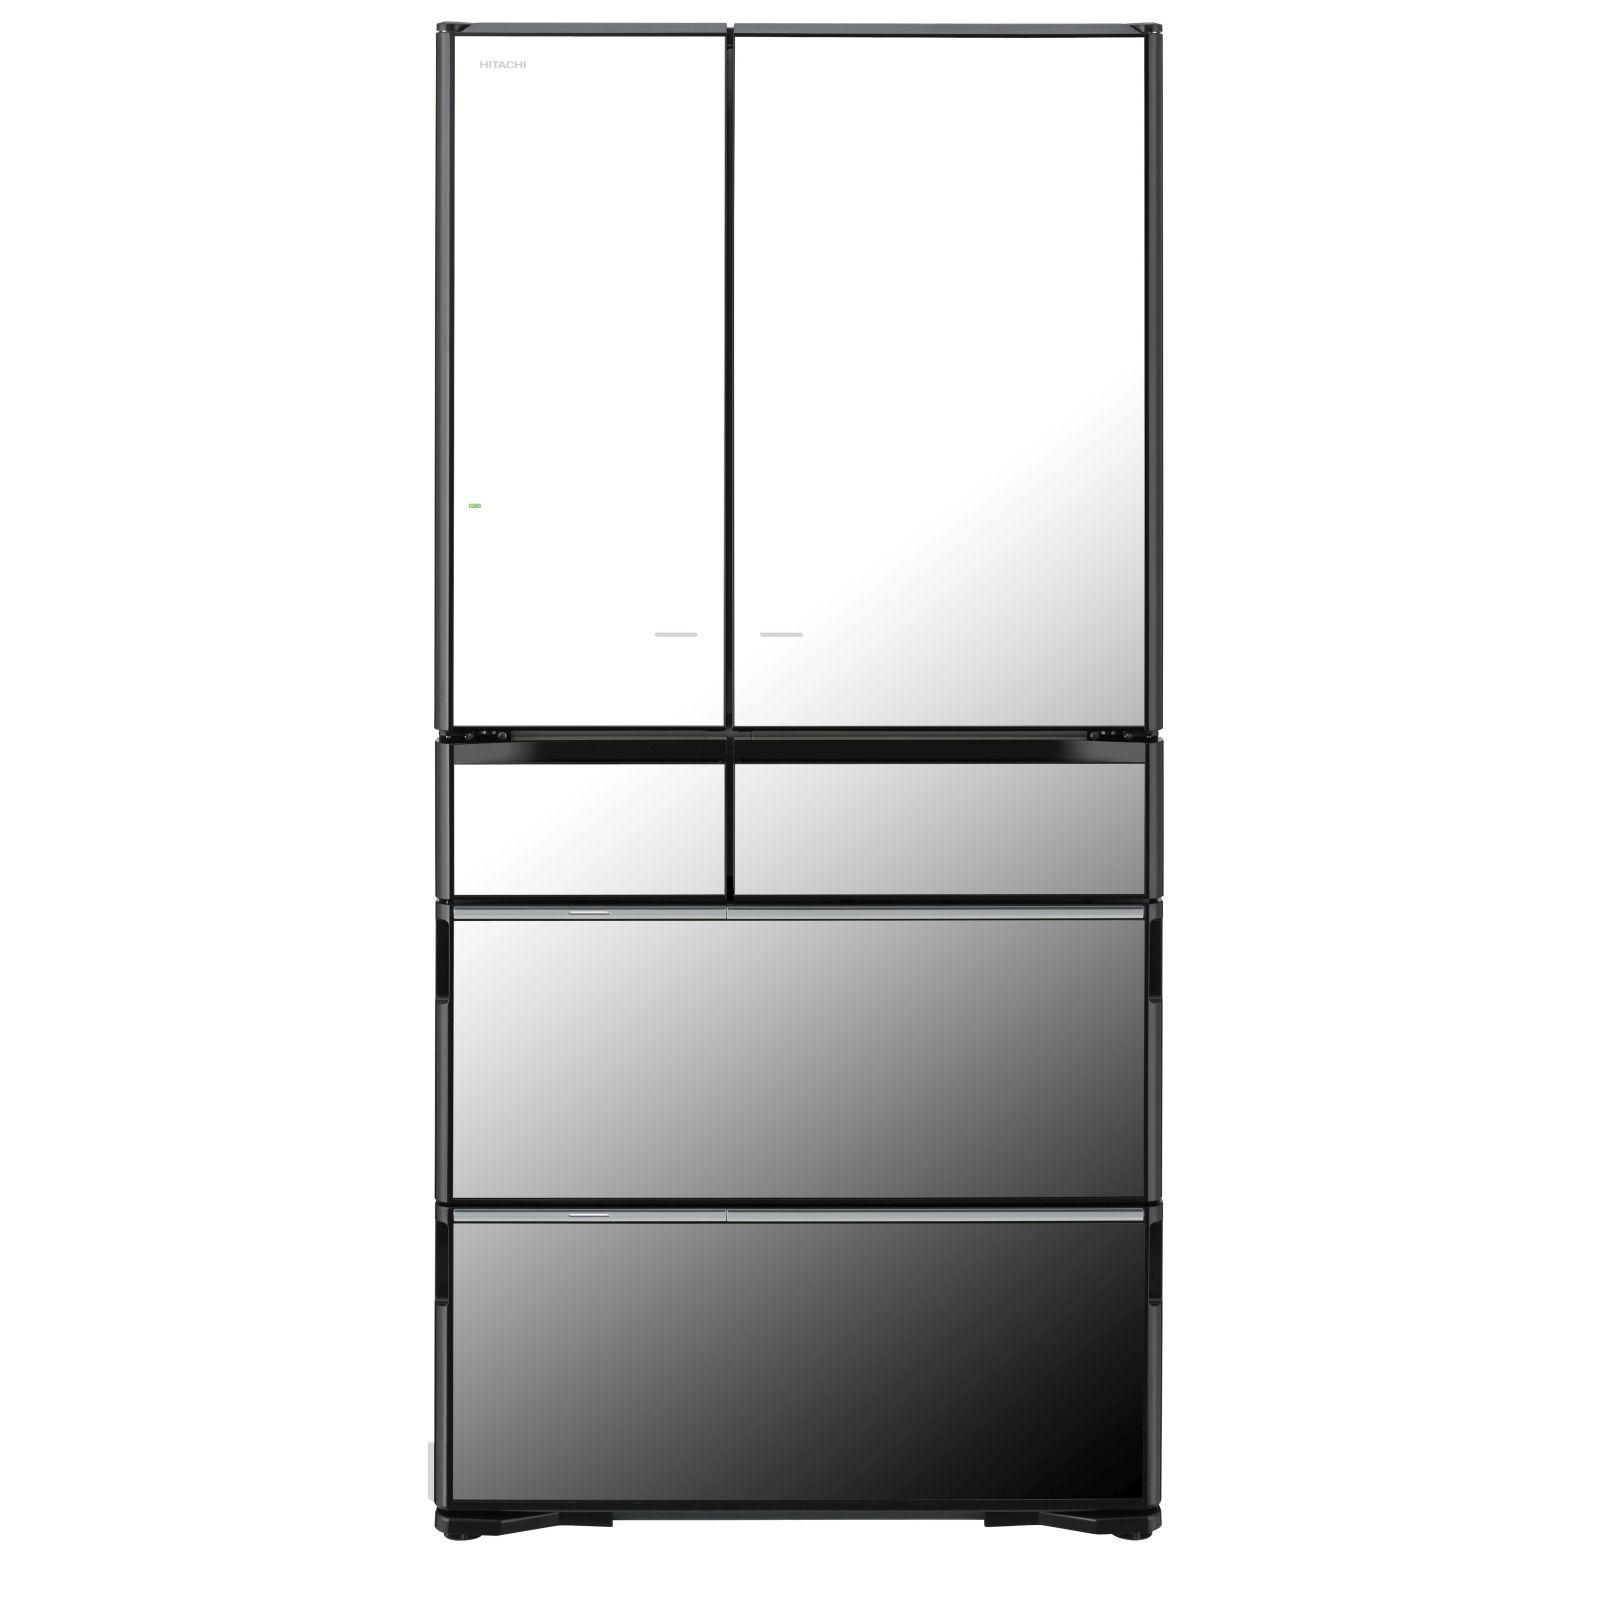 Hitachi RX730GAX Refrigerator